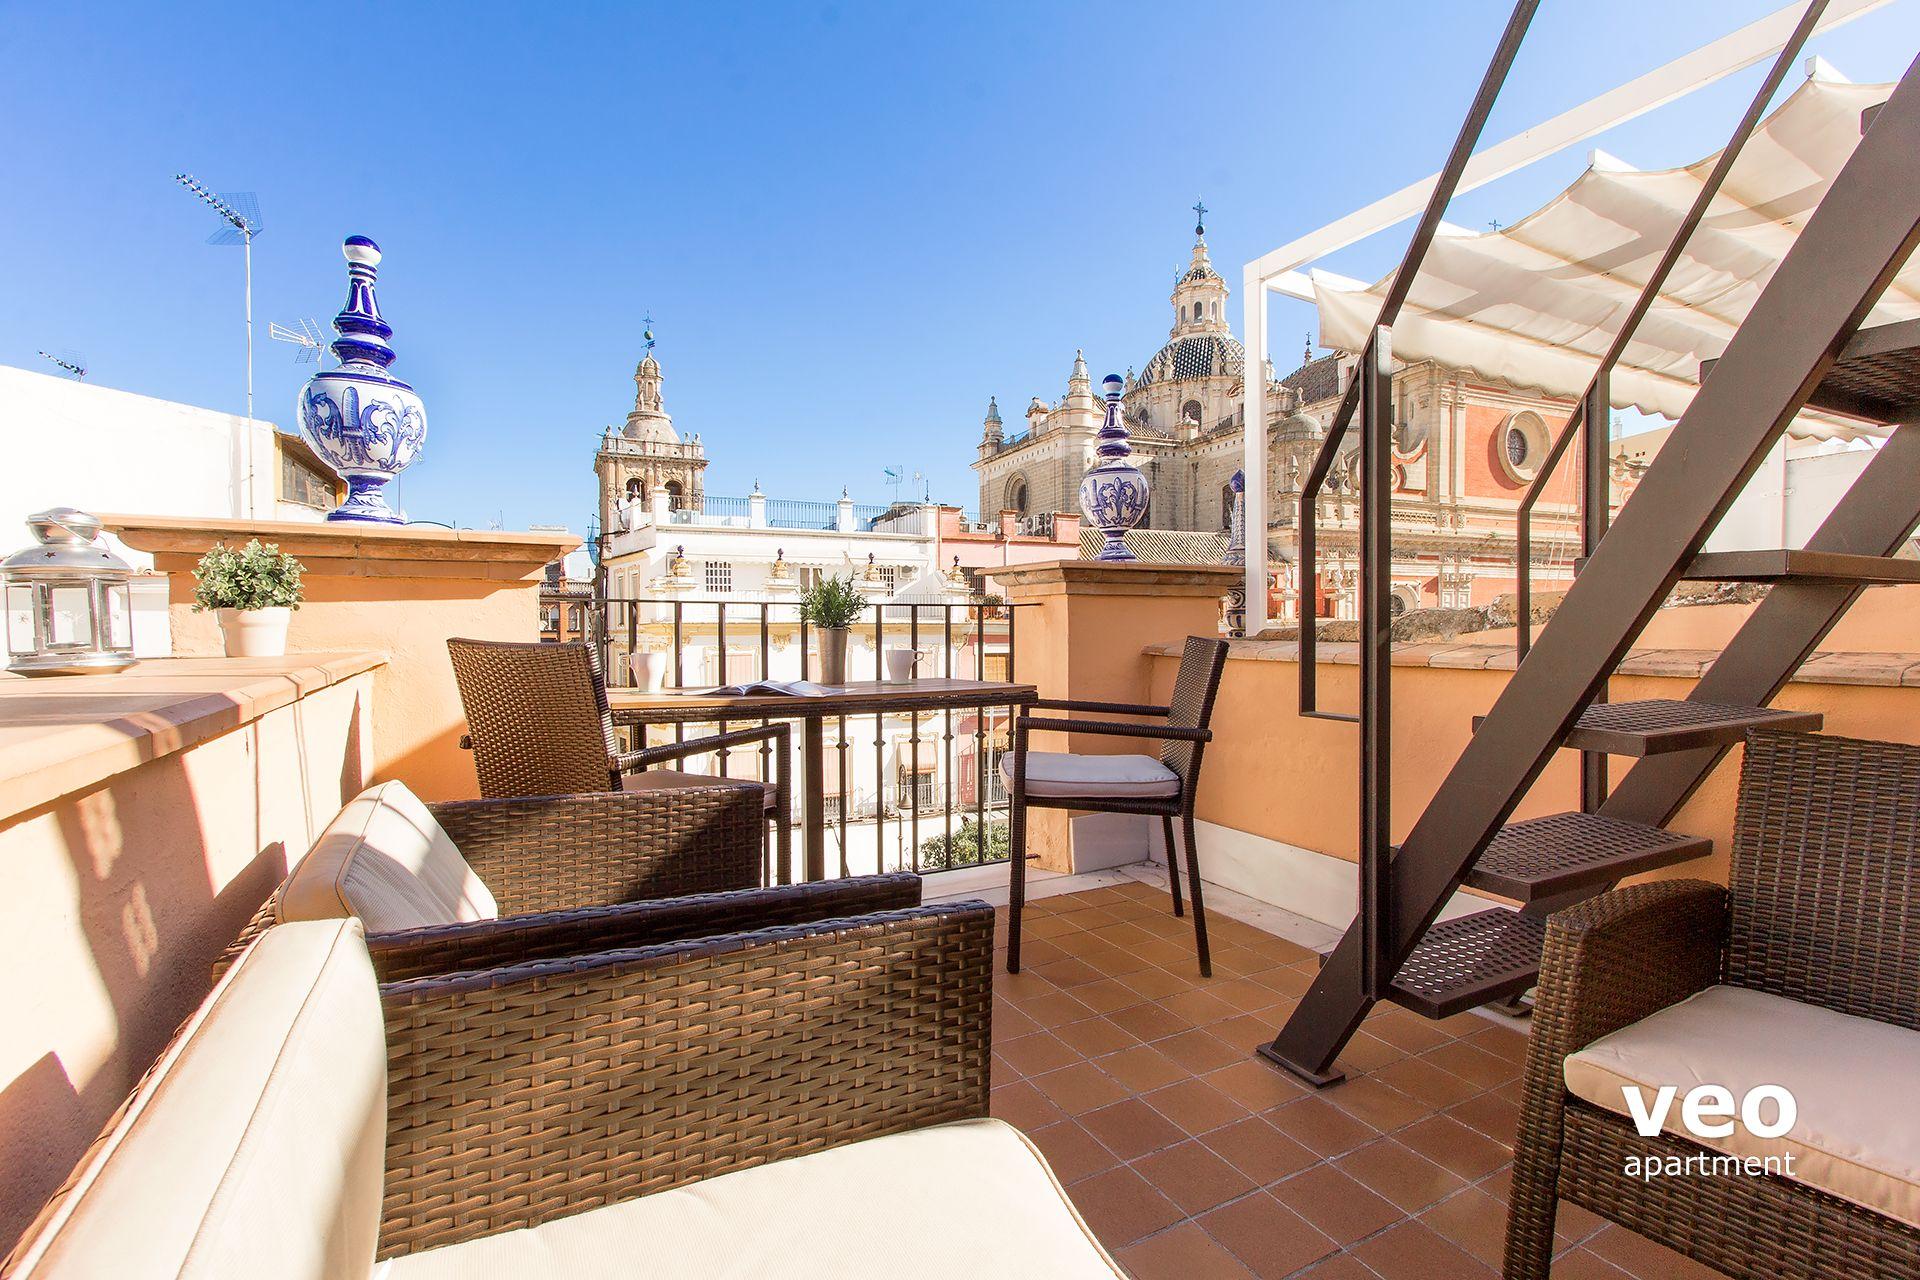 Seville apartment del salvador square seville spain for Apartment terrace furniture